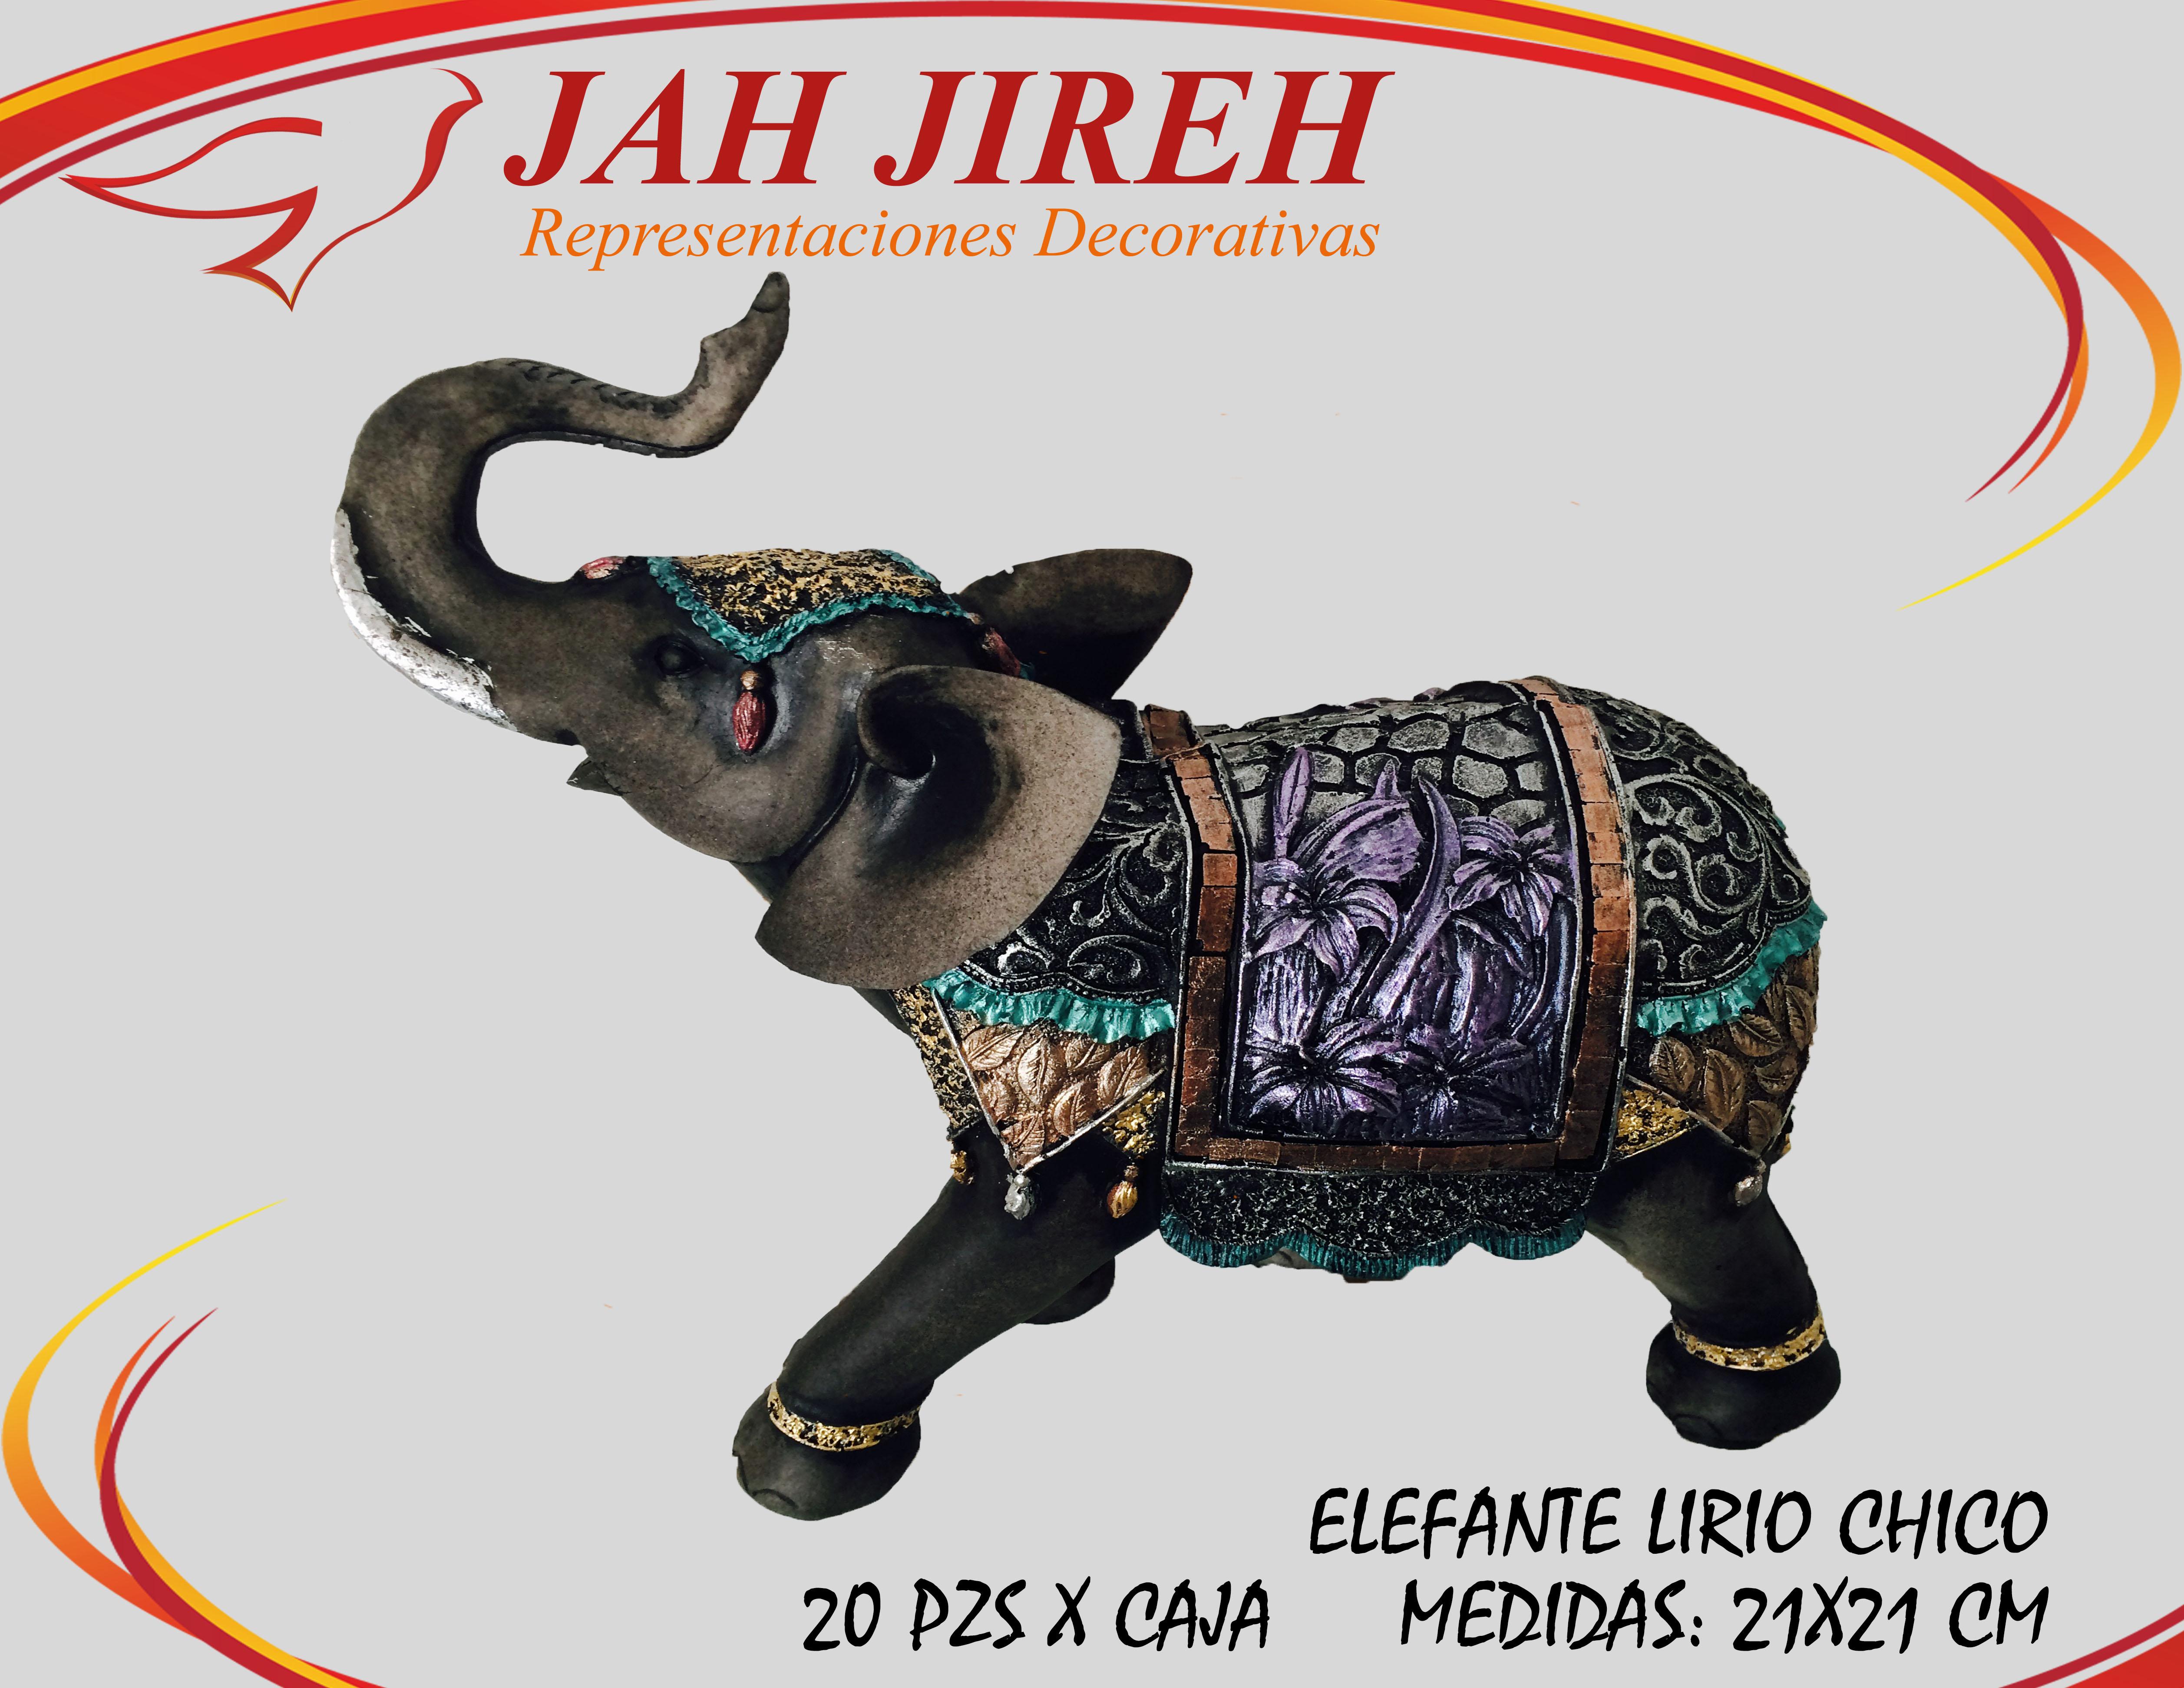 https://0201.nccdn.net/4_2/000/000/056/7dc/elefante-lirio-chico.jpg